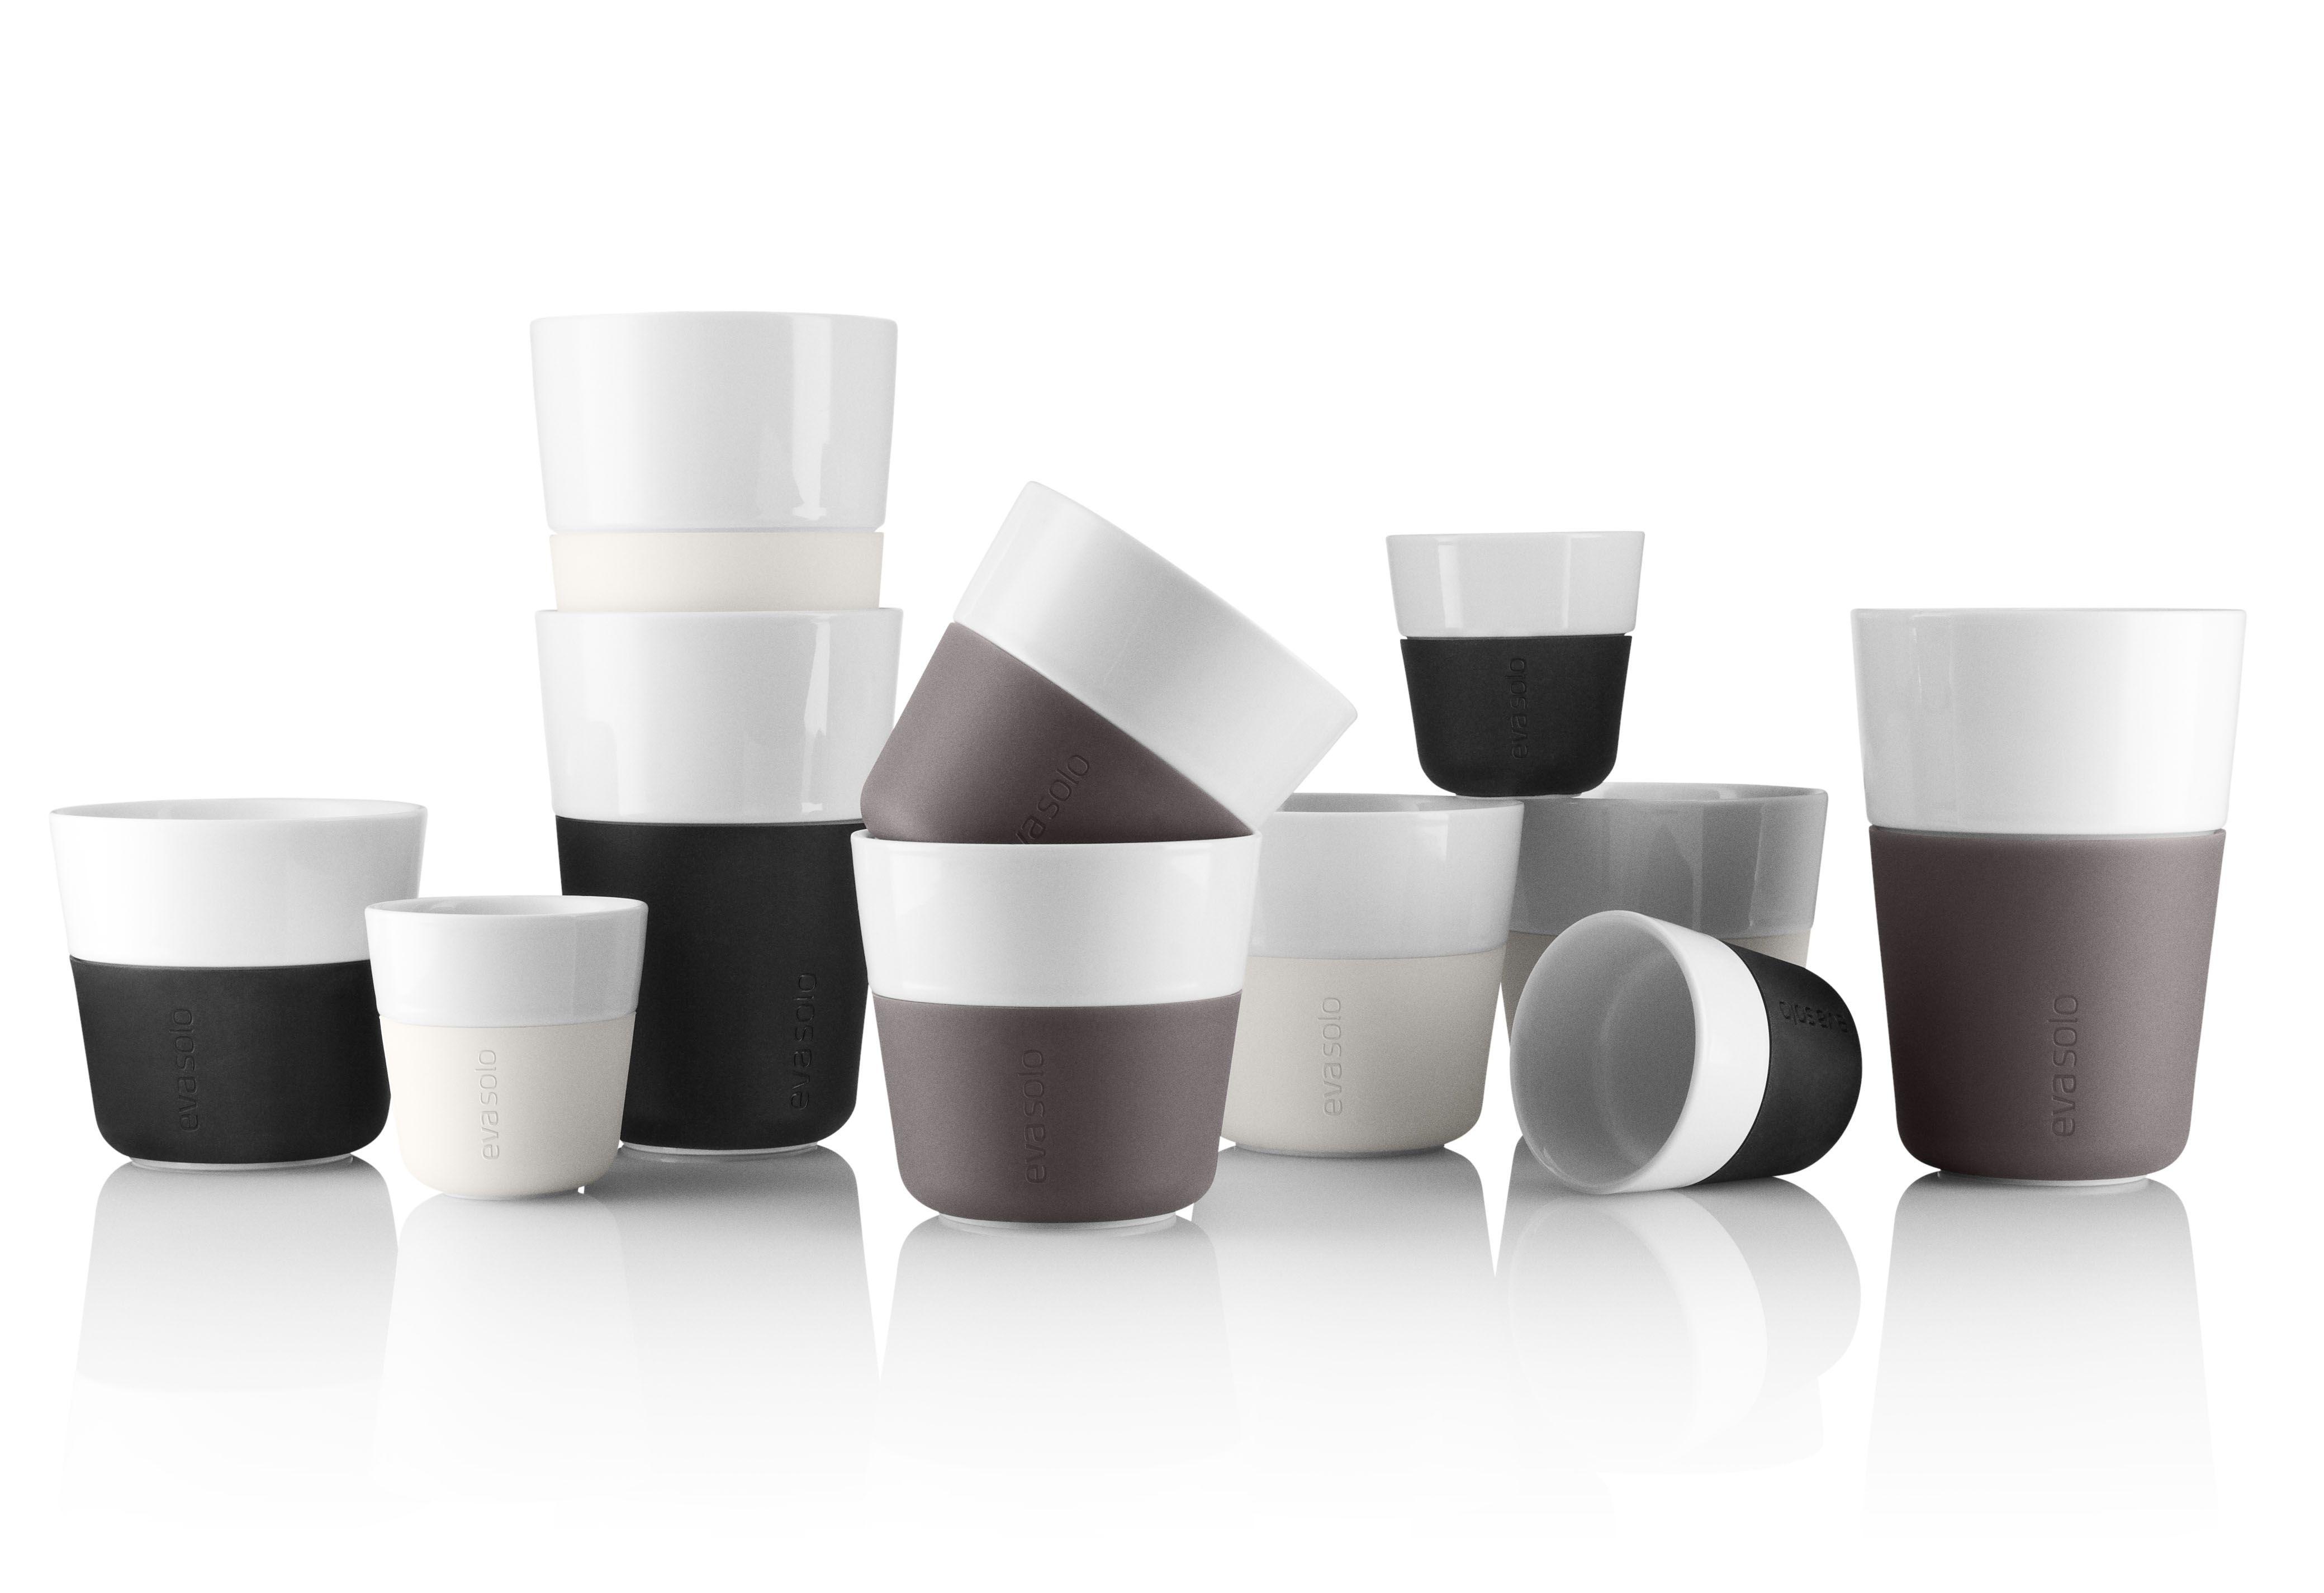 Mugs Solo Cafe Coffe EspressoEverything Eva LatteLungoamp; xdrBCoeW